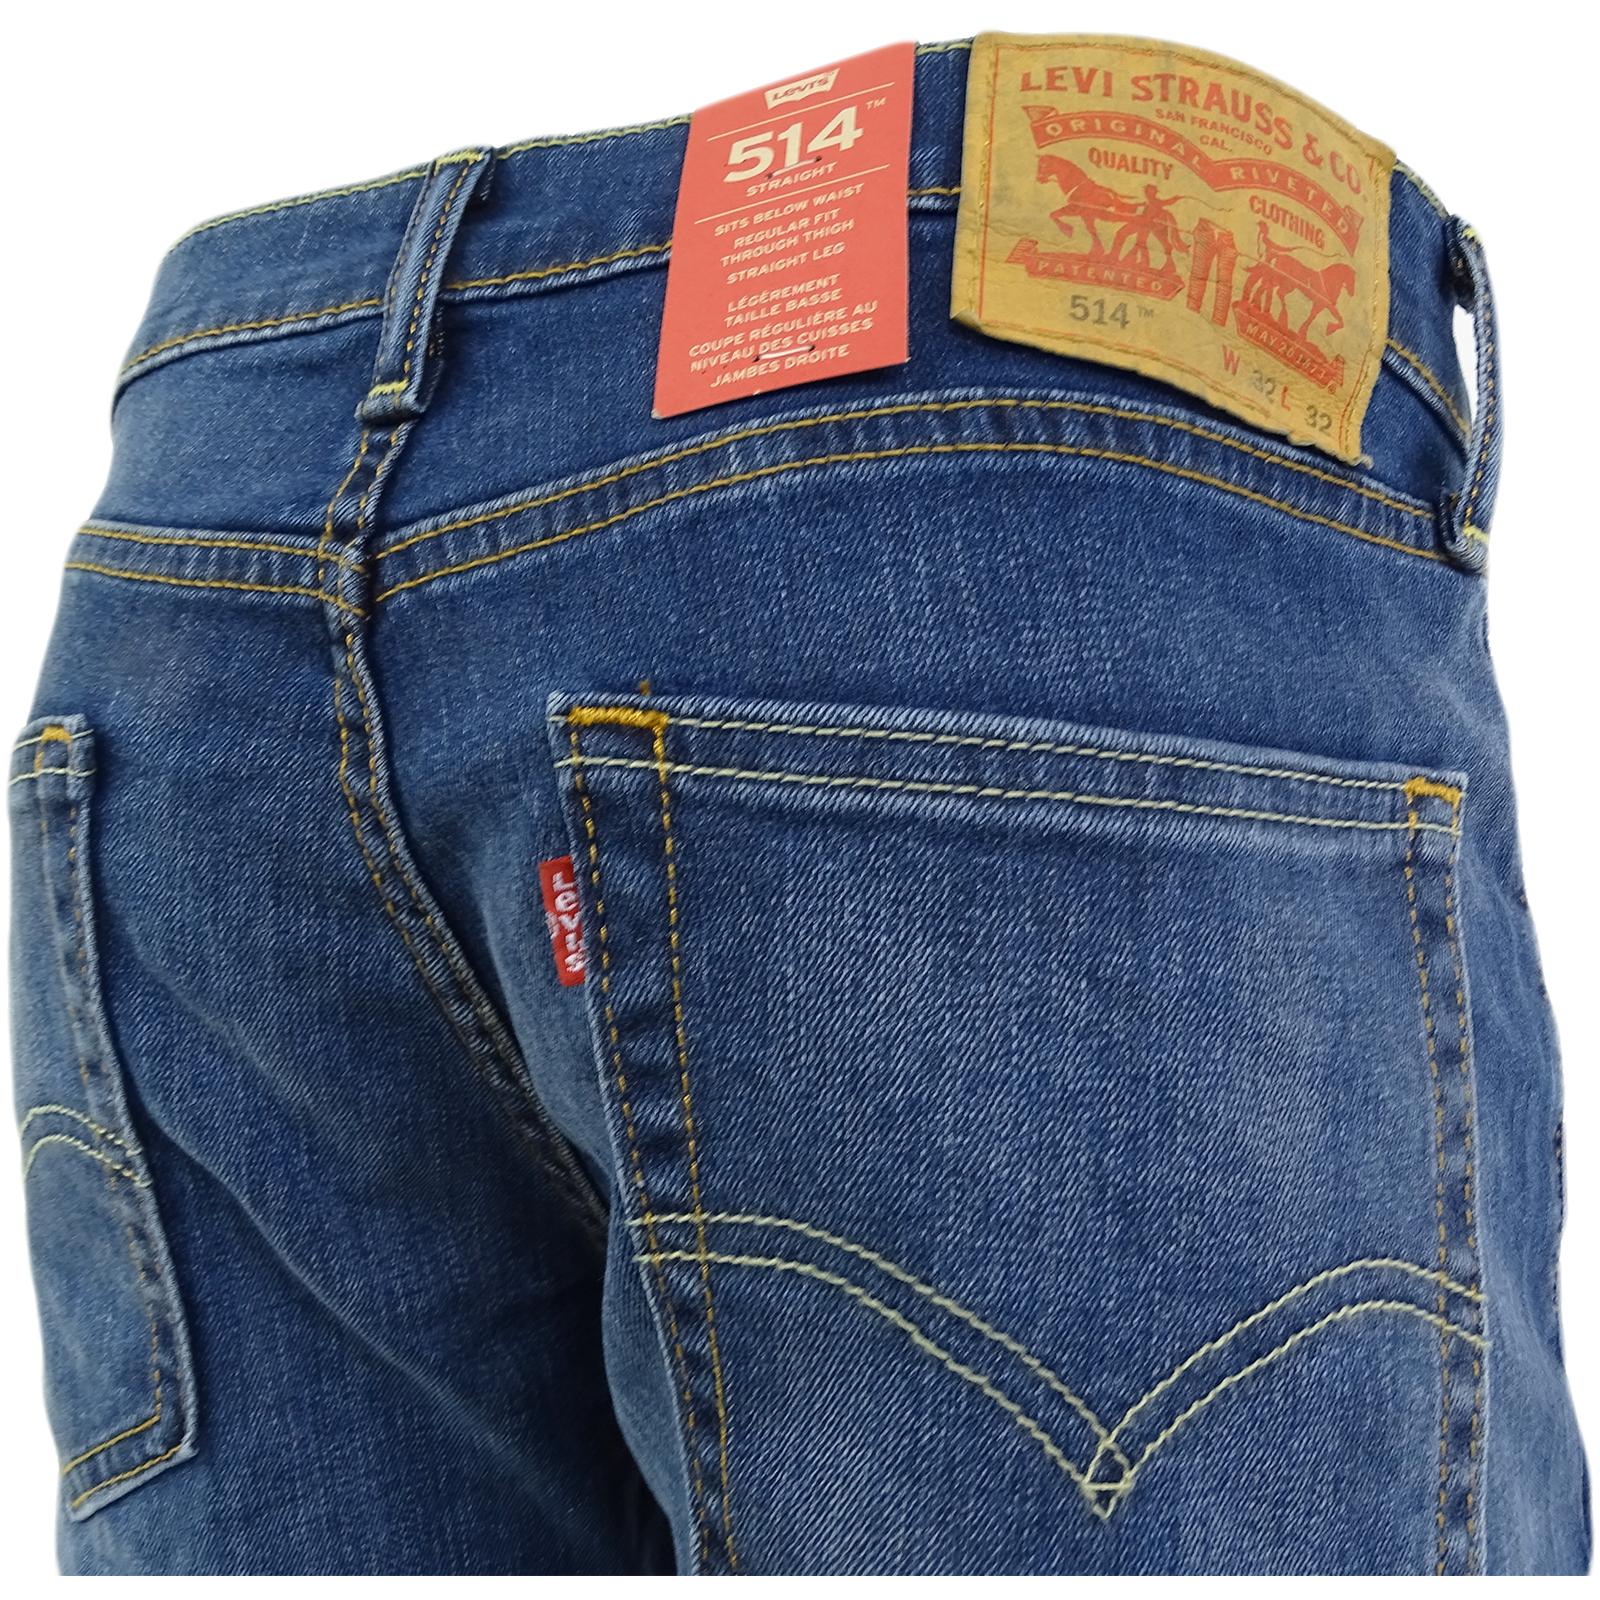 0c5fb8edc4 Sentinel Levi Strauss 09-78 514 Straight Leg Jean